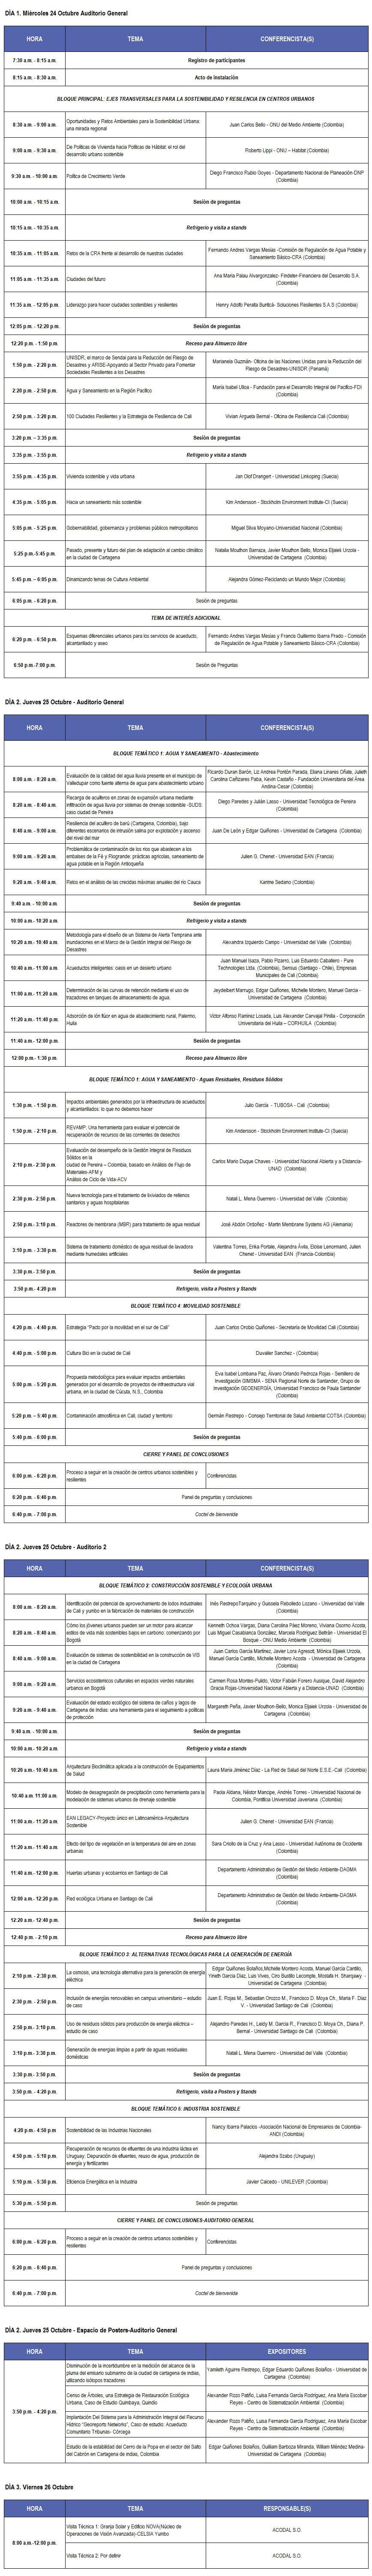 Calendario Comercial Colombia 2019 Más Actual 2do Seminario Internacional Centros Urbanos sostenible Of Calendario Comercial Colombia 2019 Más Recientemente Liberado Imagenes De Calendario 2015 Haskatashort